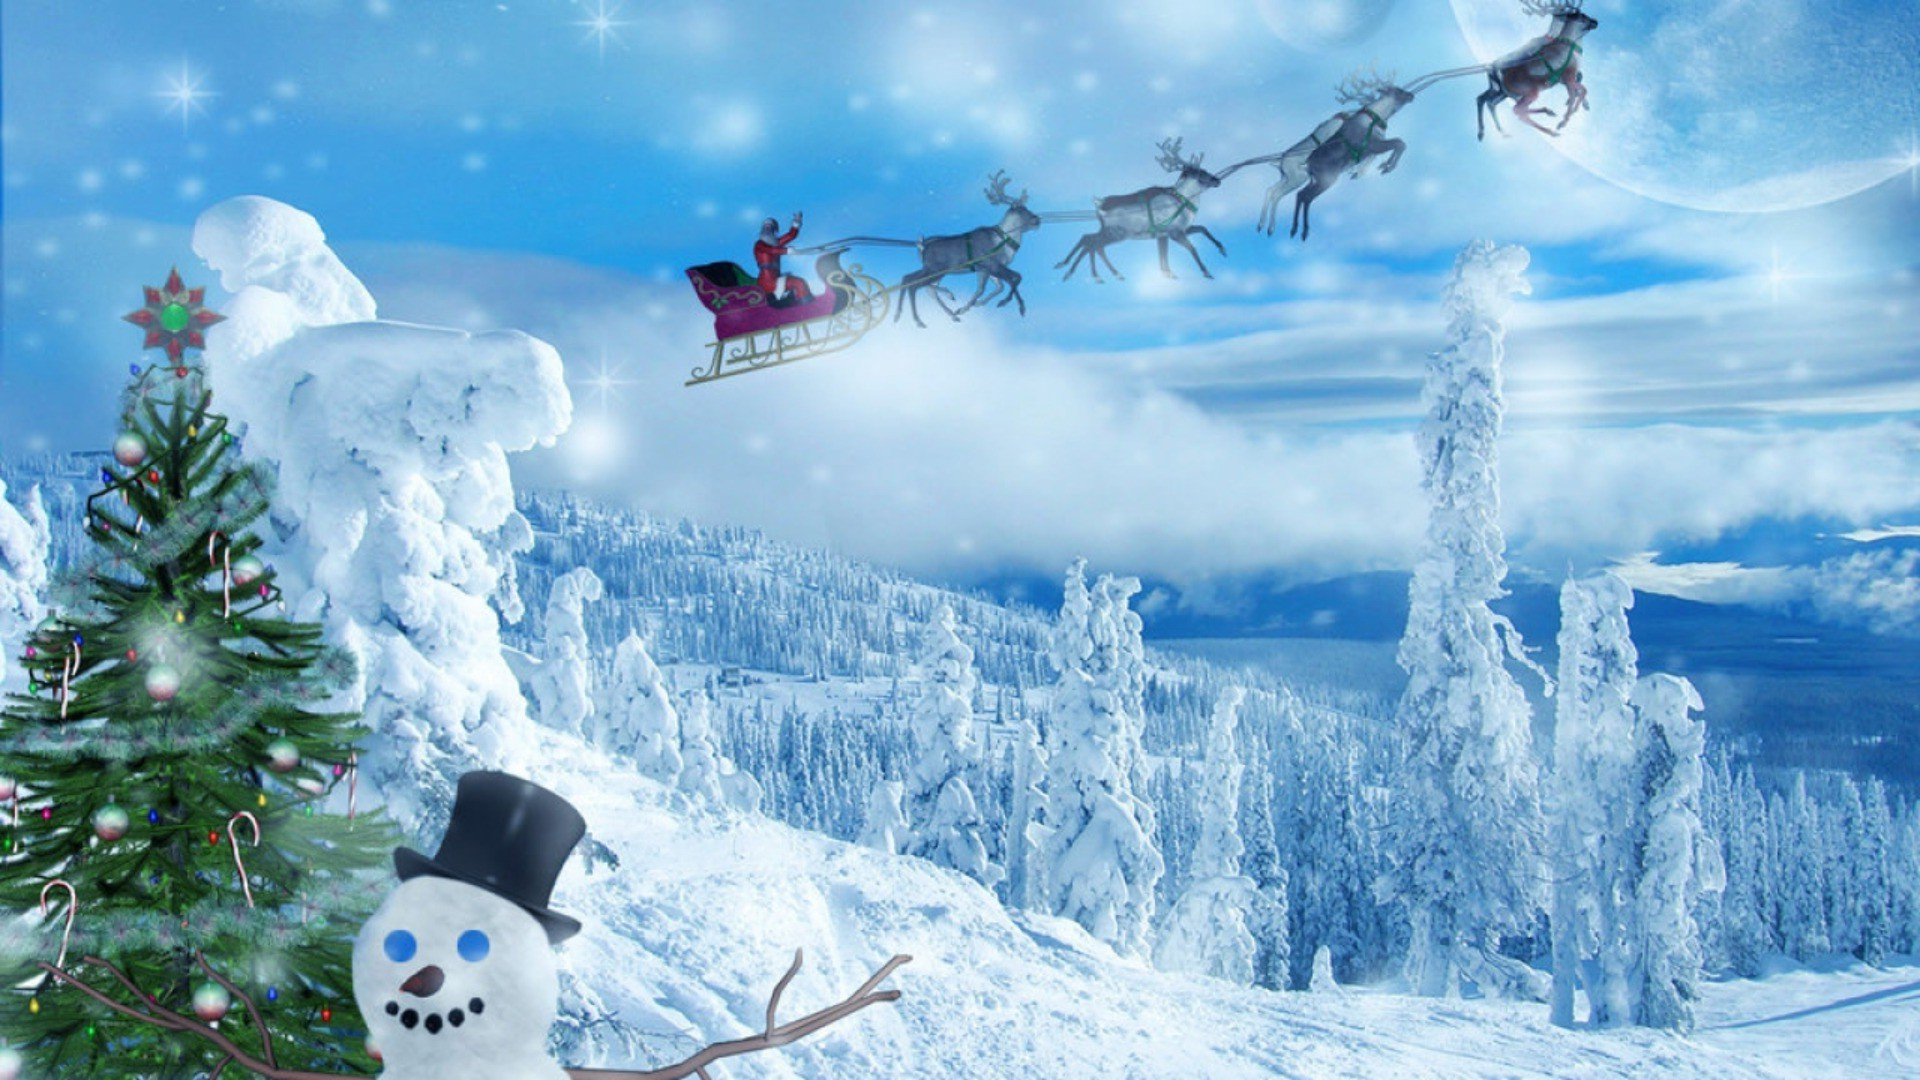 Winter Forest Christmas Tree Snowman Santa On Reindeer